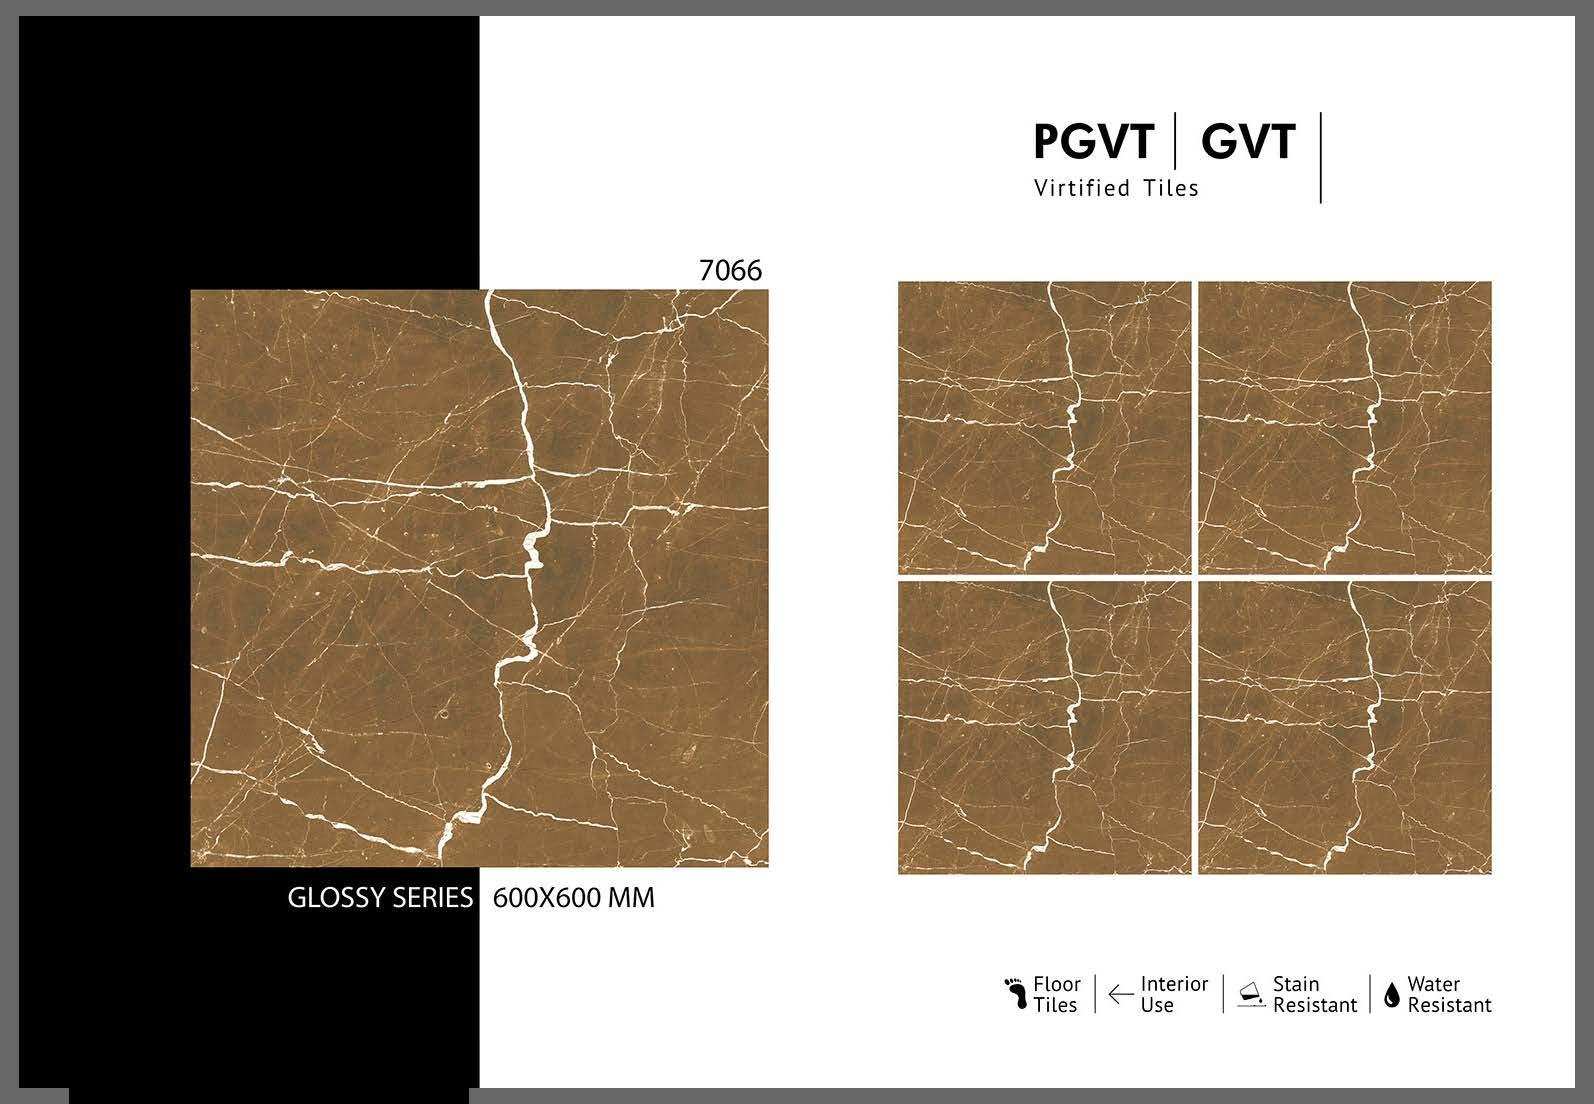 GVT 2X2 GLOSSY_Page_53.jpg